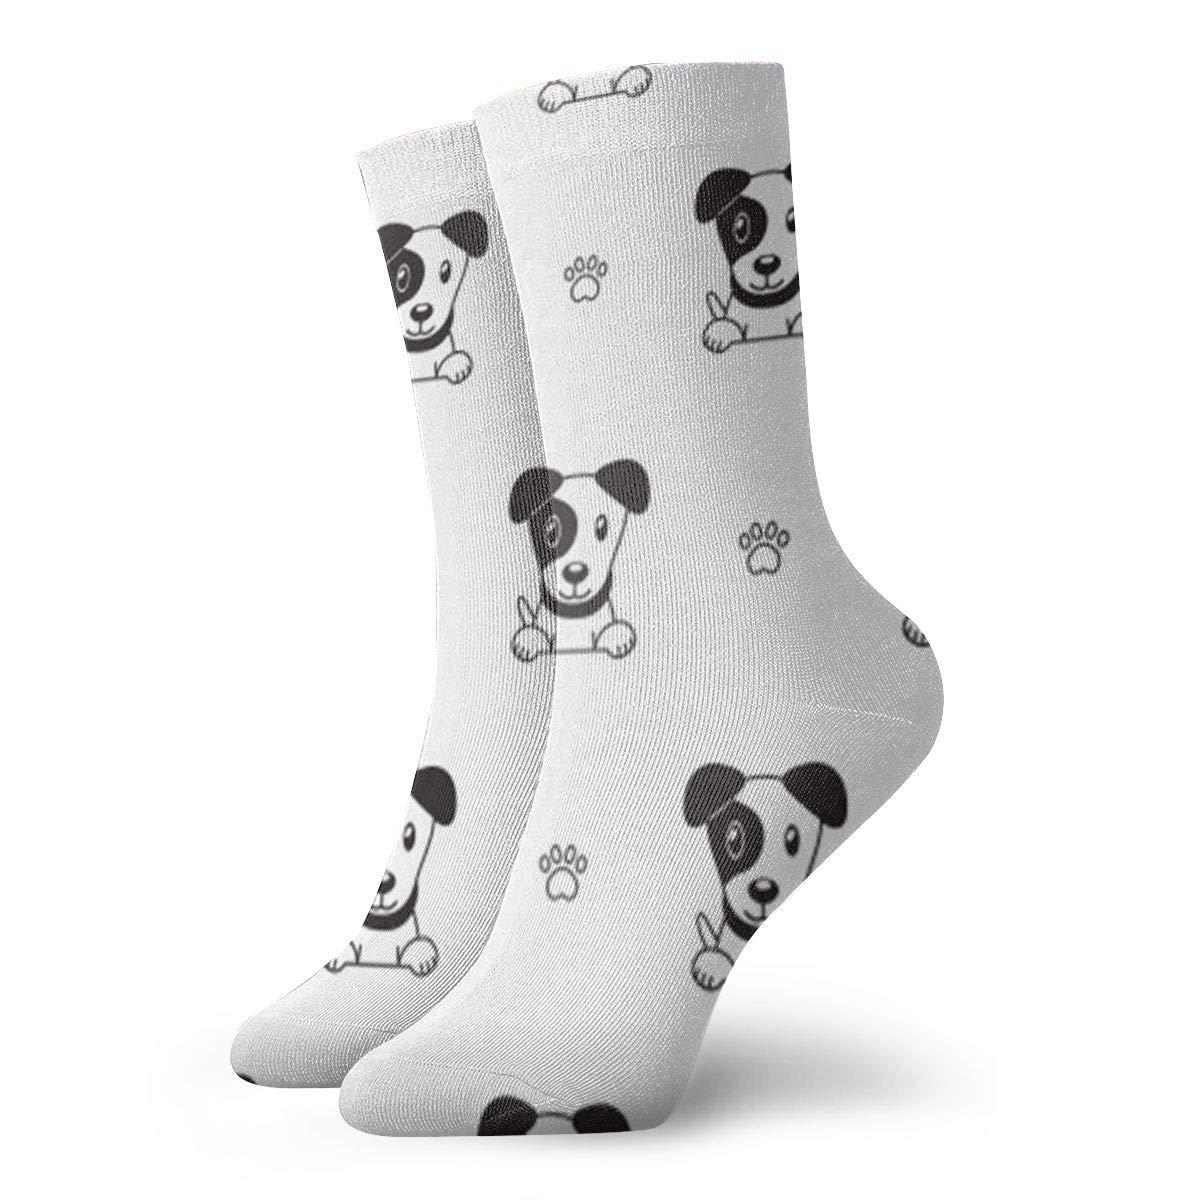 Terrier Dog Unisex Funny Casual Crew Socks Athletic Socks For Boys Girls Kids Teenagers